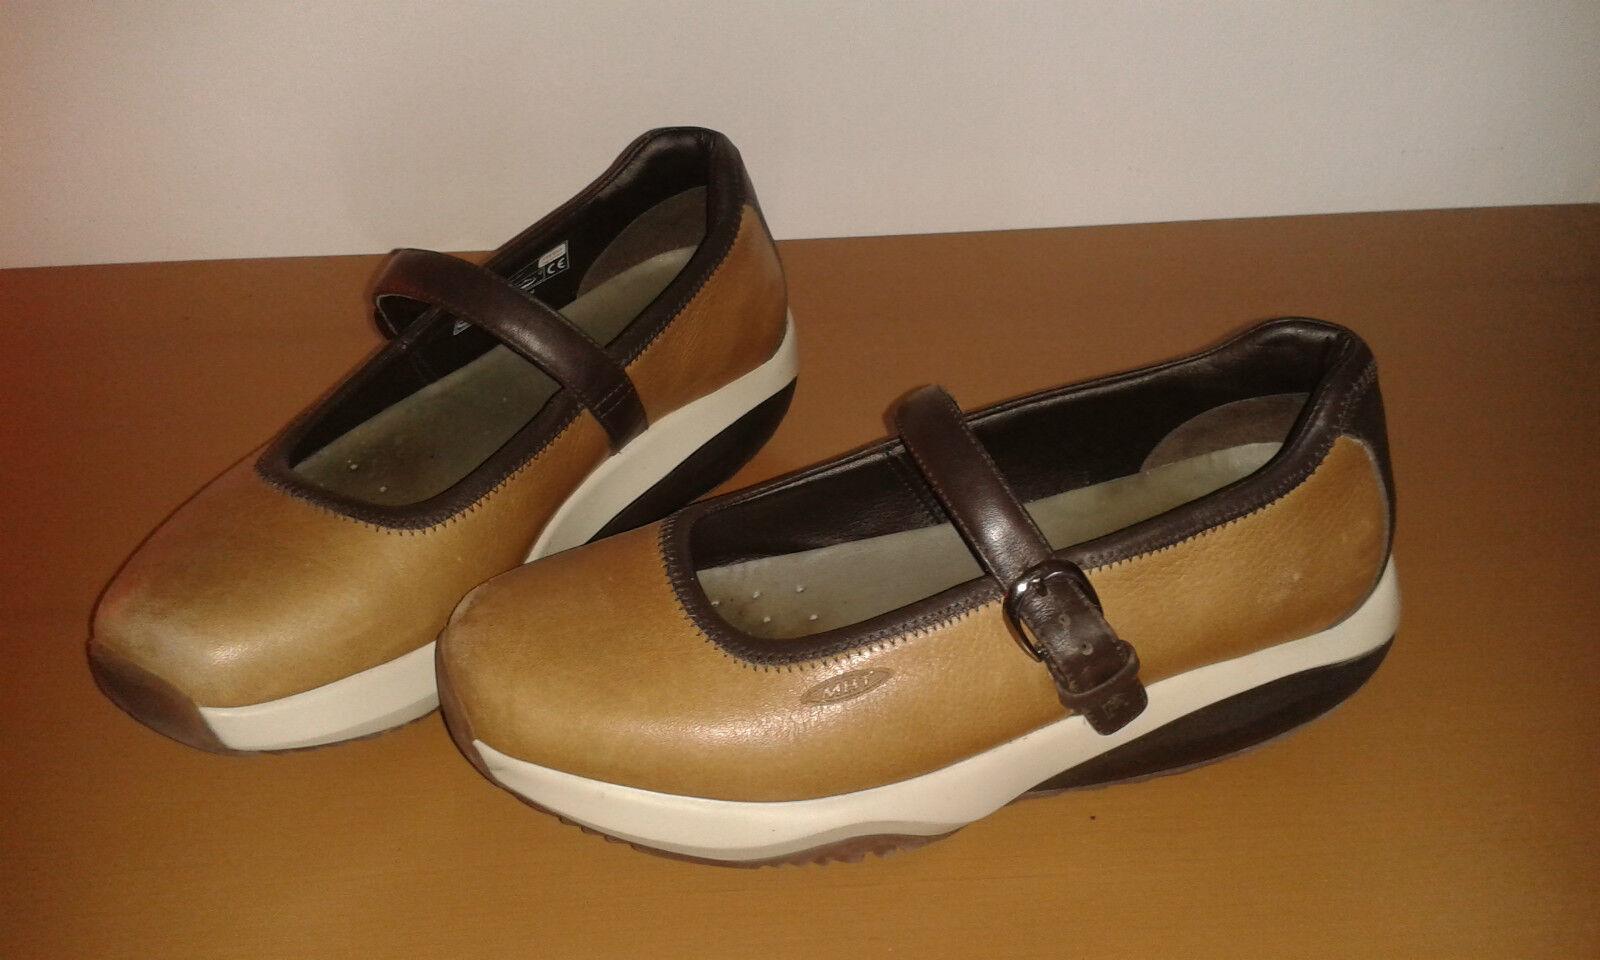 MBT Sandale Schuhe Größe 39